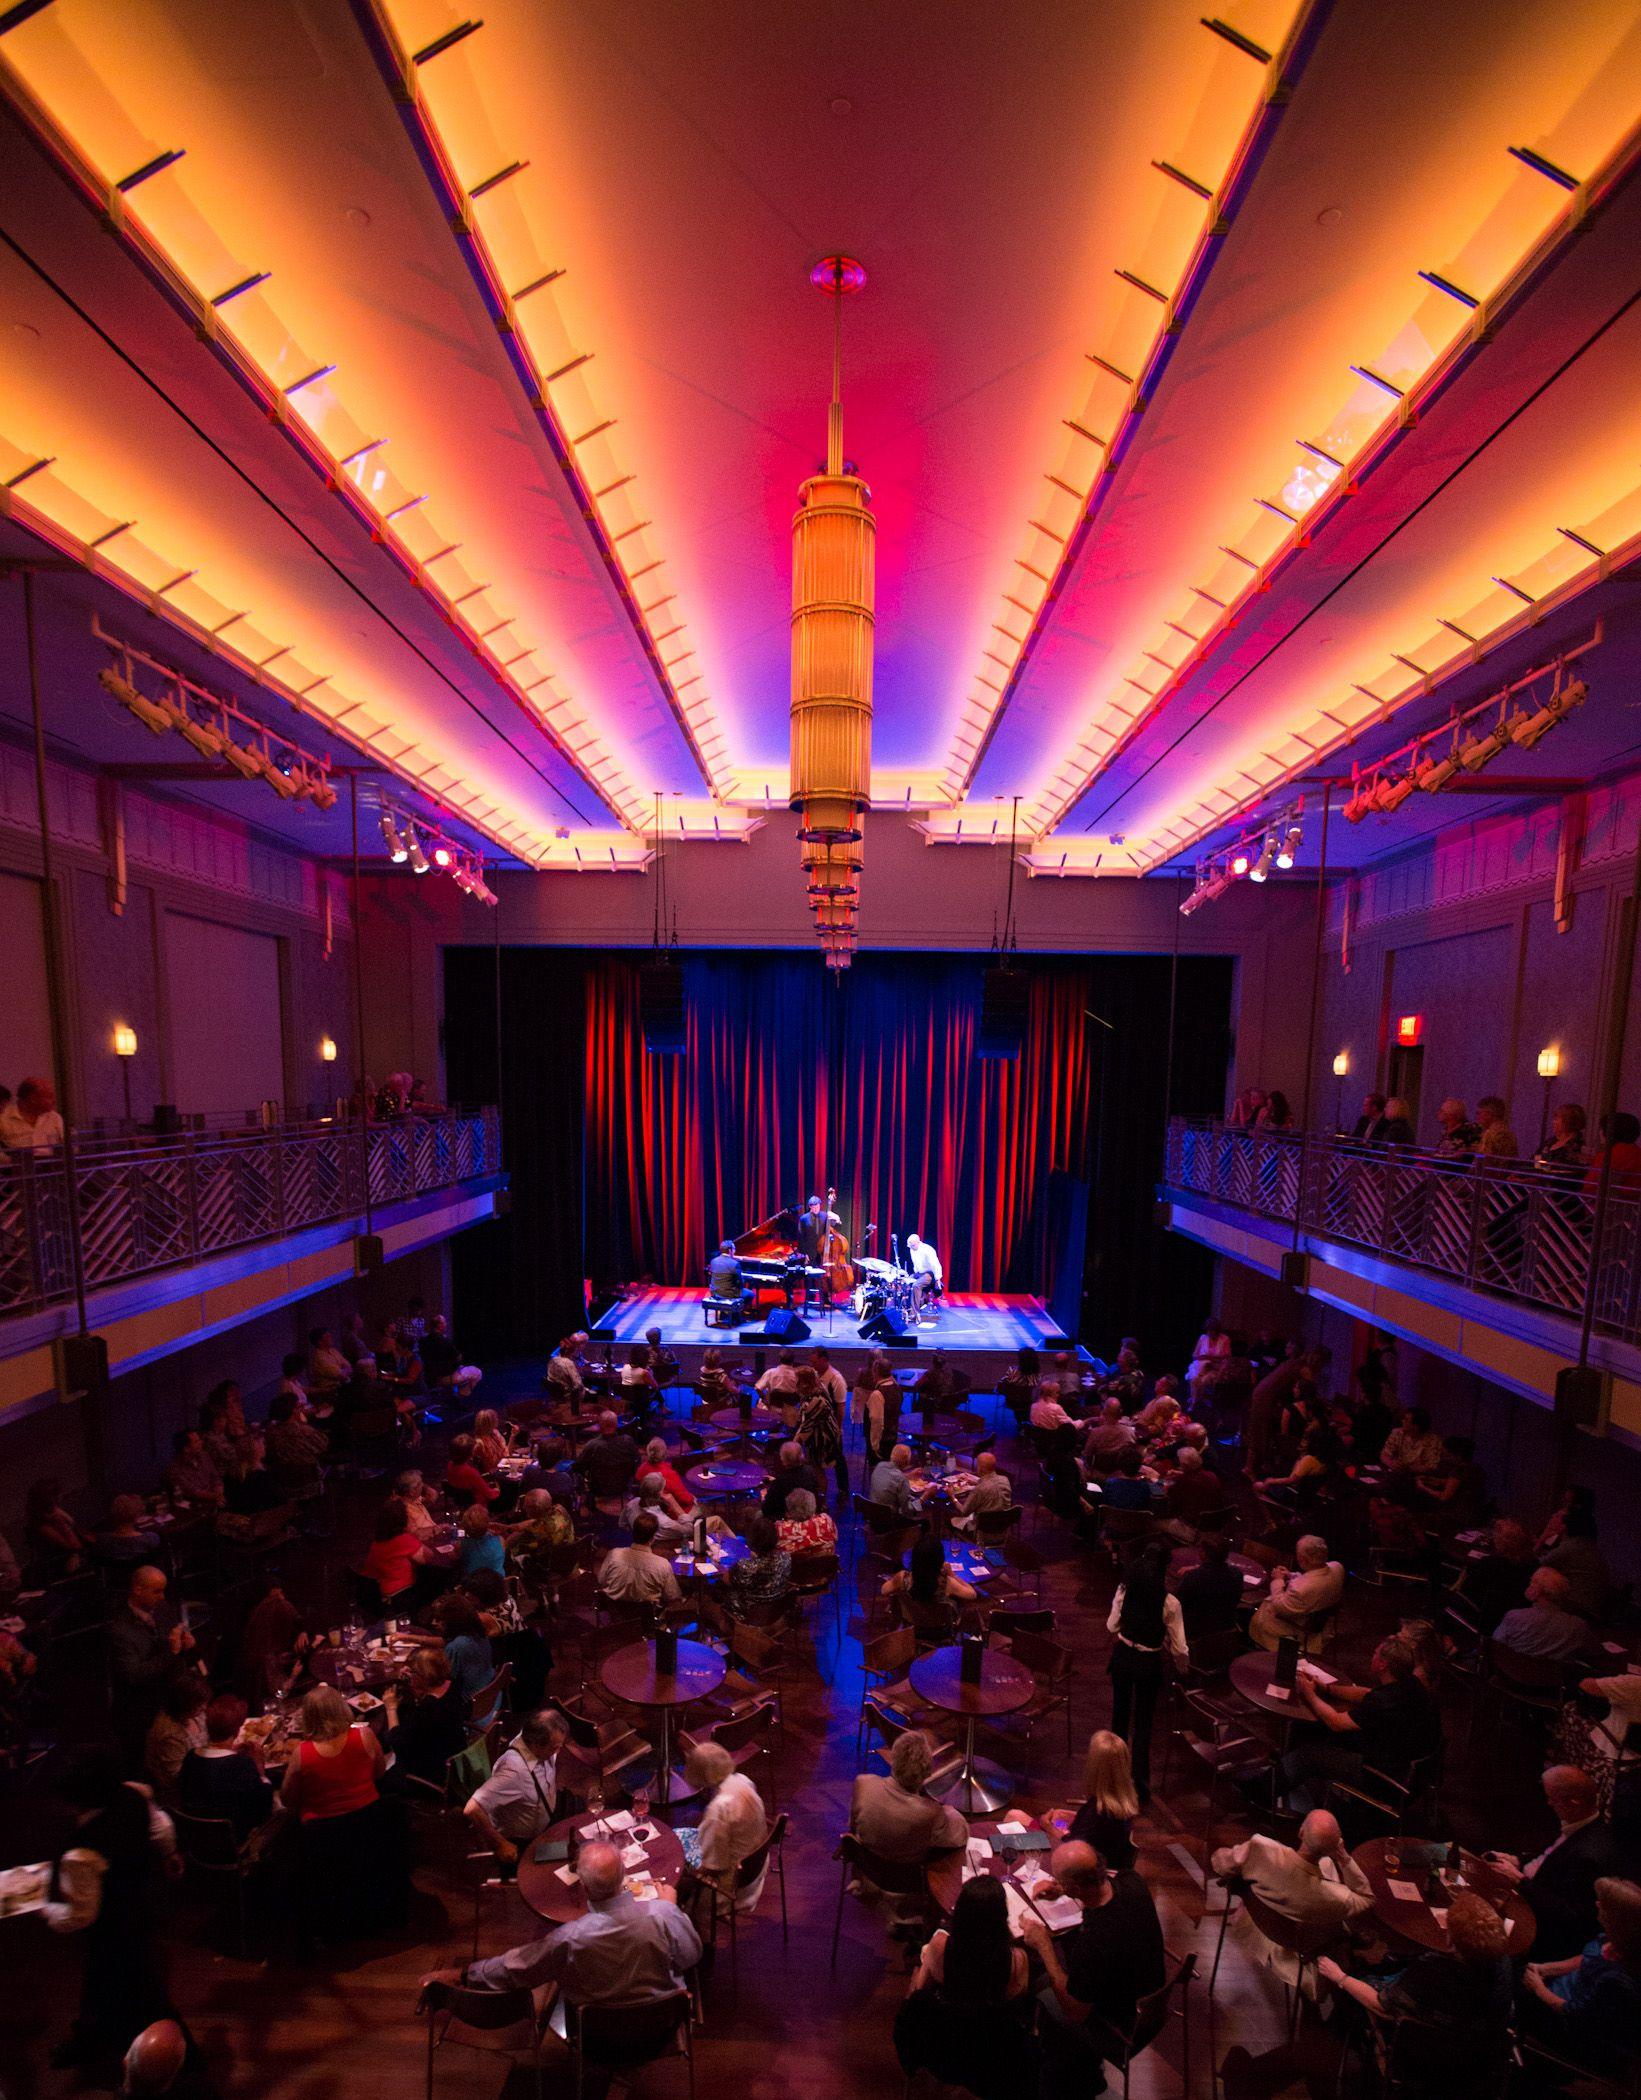 Myron S Cabaret Jazz At The Smith Center Jazz Club Cabaret Music Venue